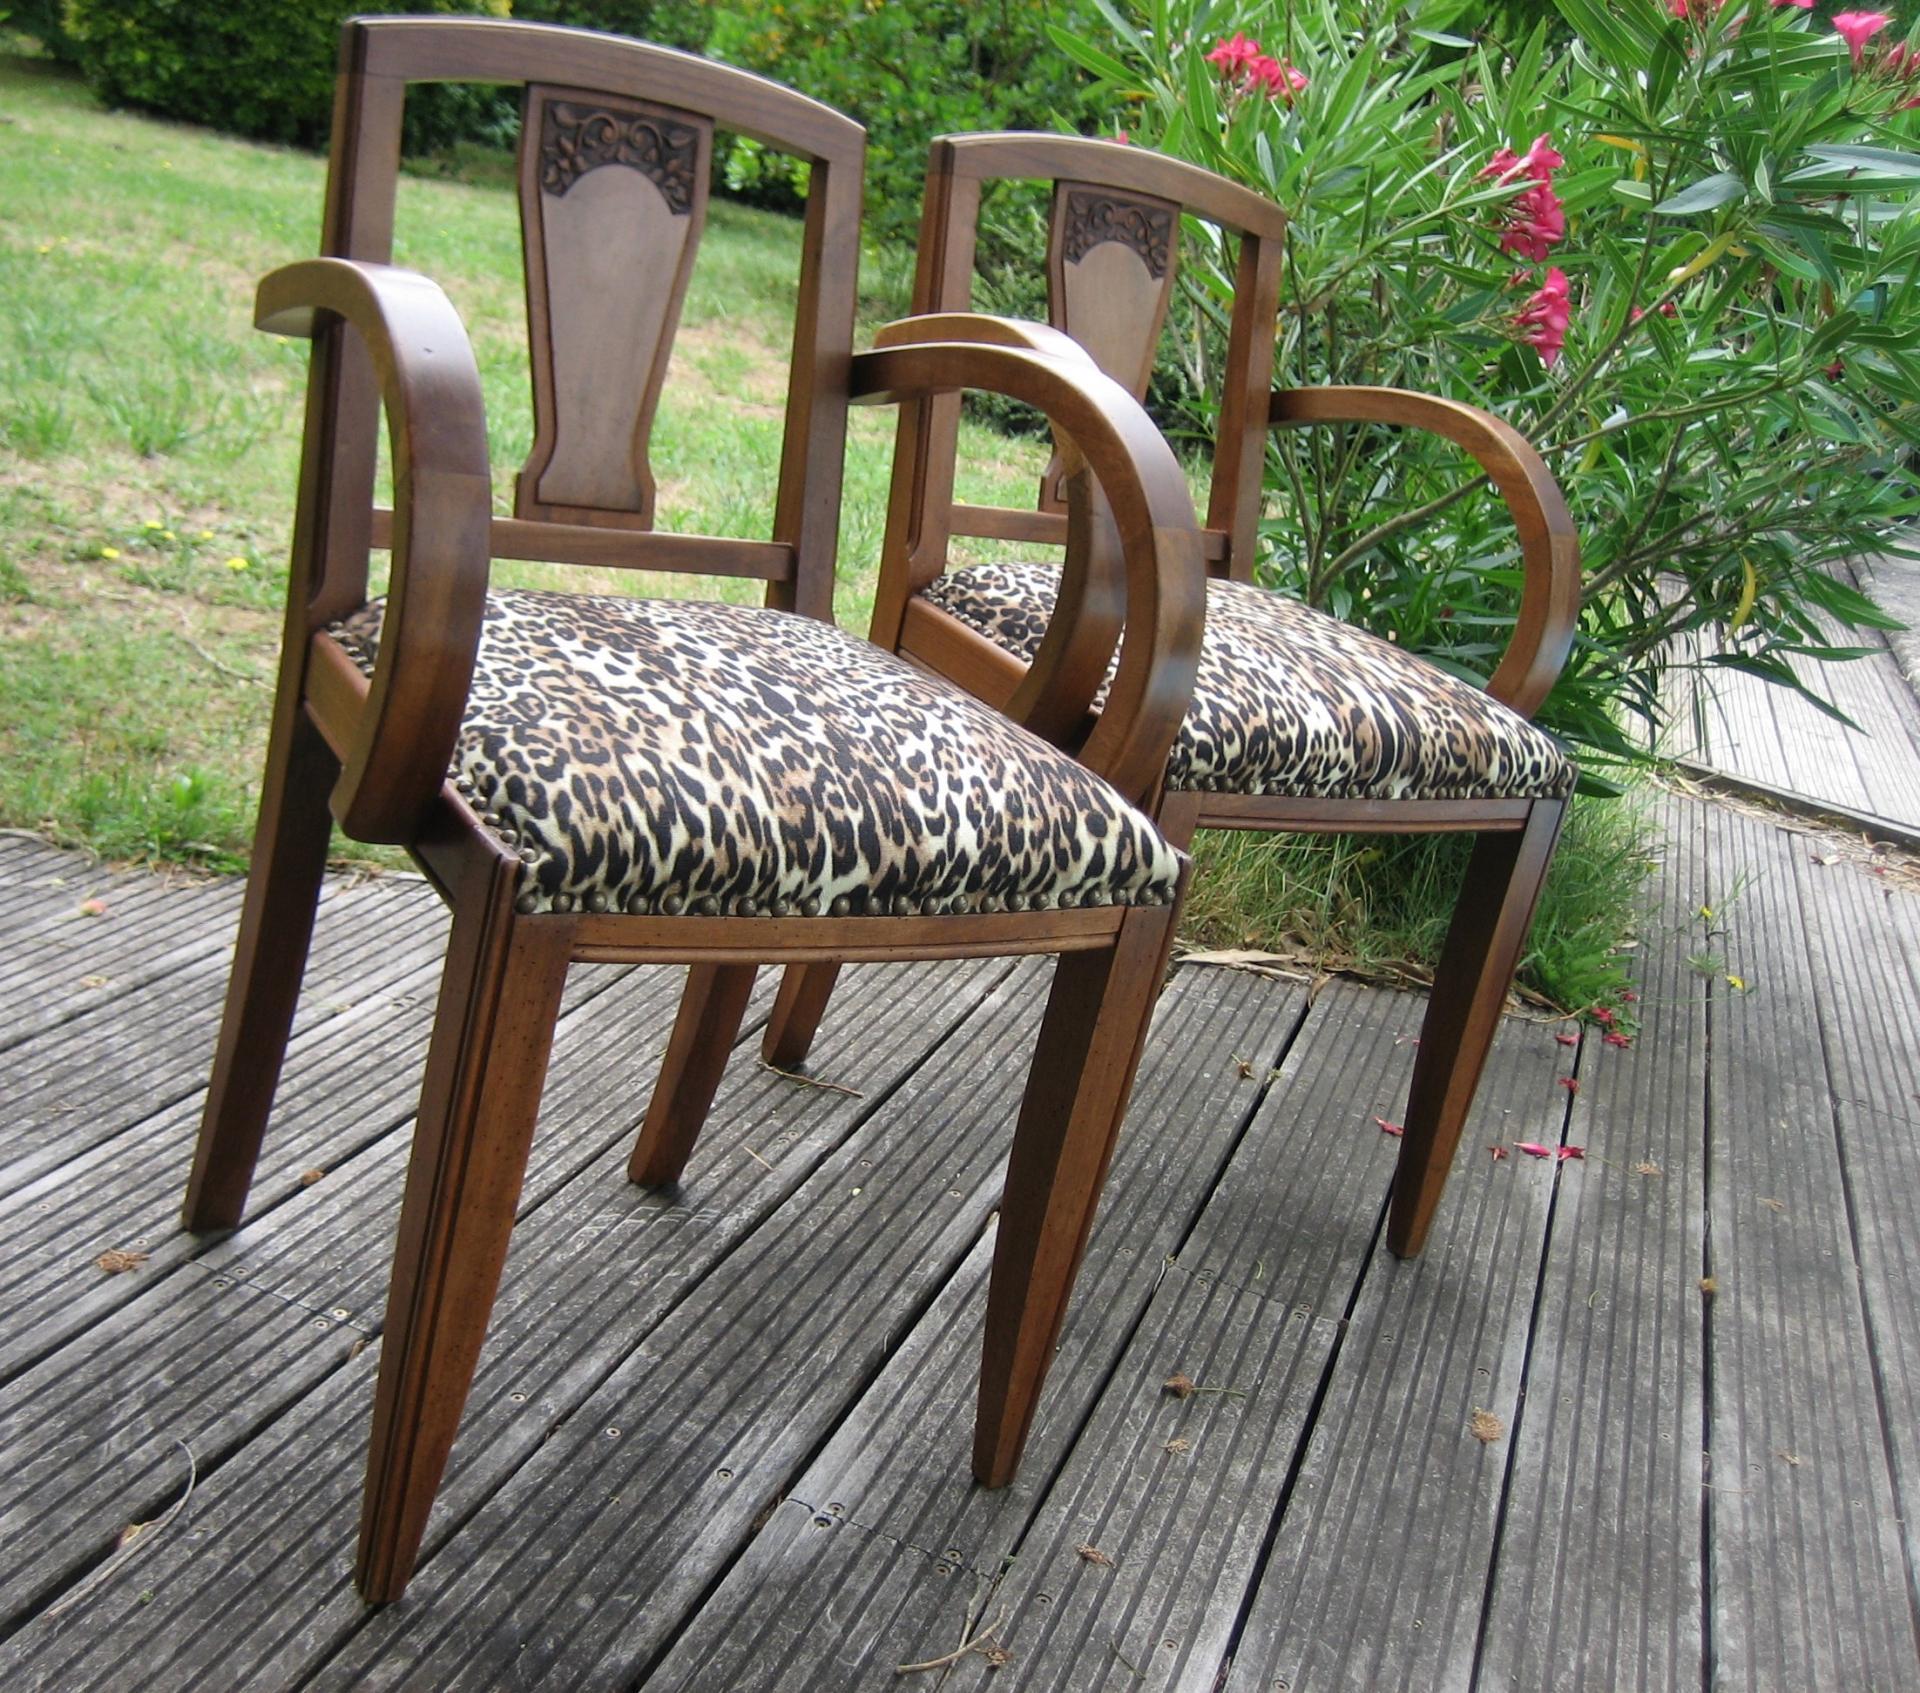 Collection a bini lin impression leopard